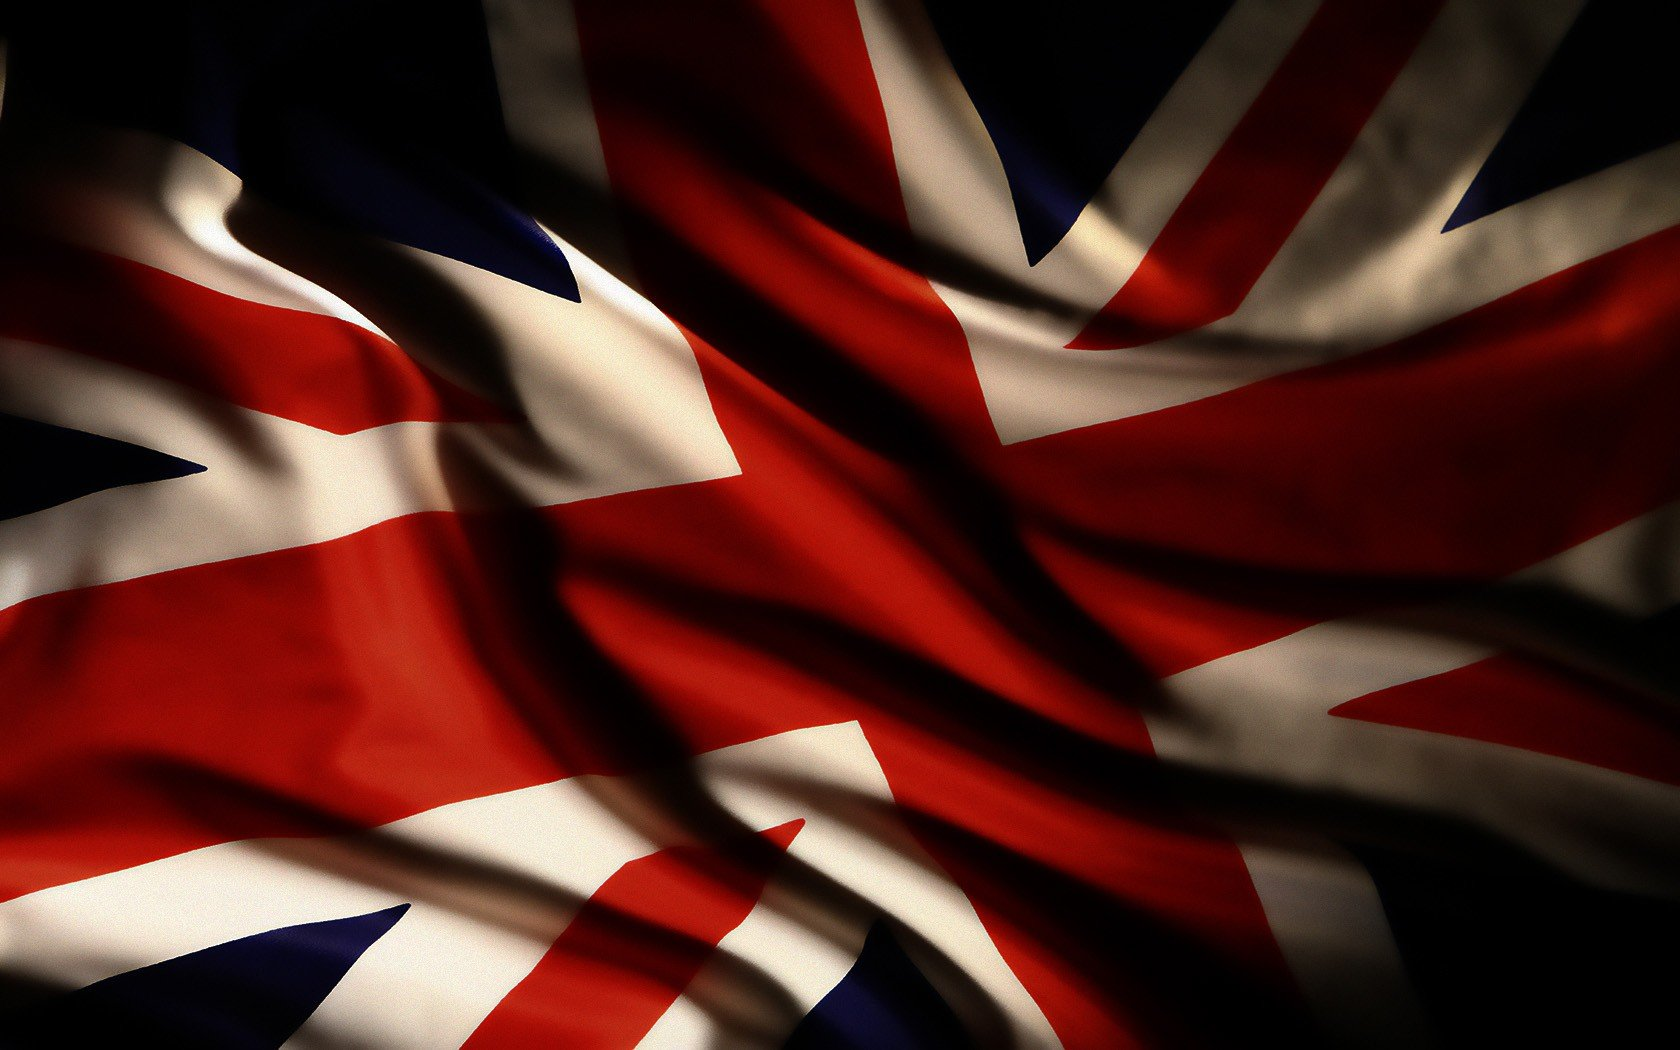 flags United Kingdom Union Jack wallpaper background 1680x1050